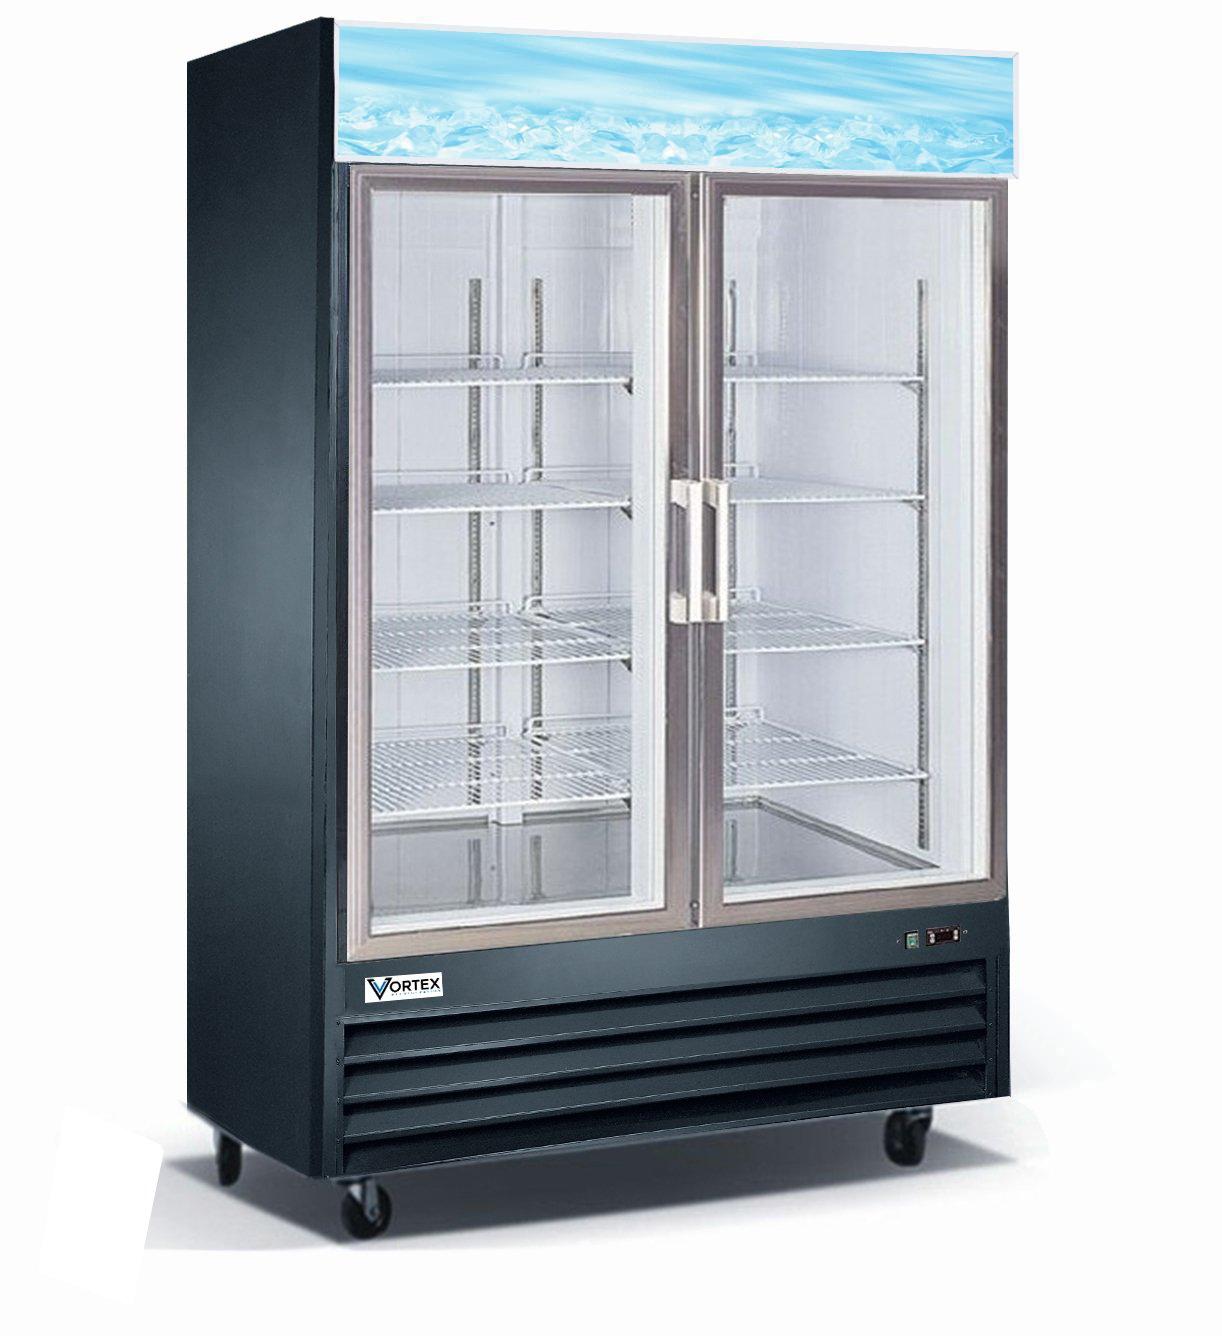 Vortex Refrigeration Commercial 2 Glass Door Black Merchandiser Refrigerator - 45 Cu. Ft.